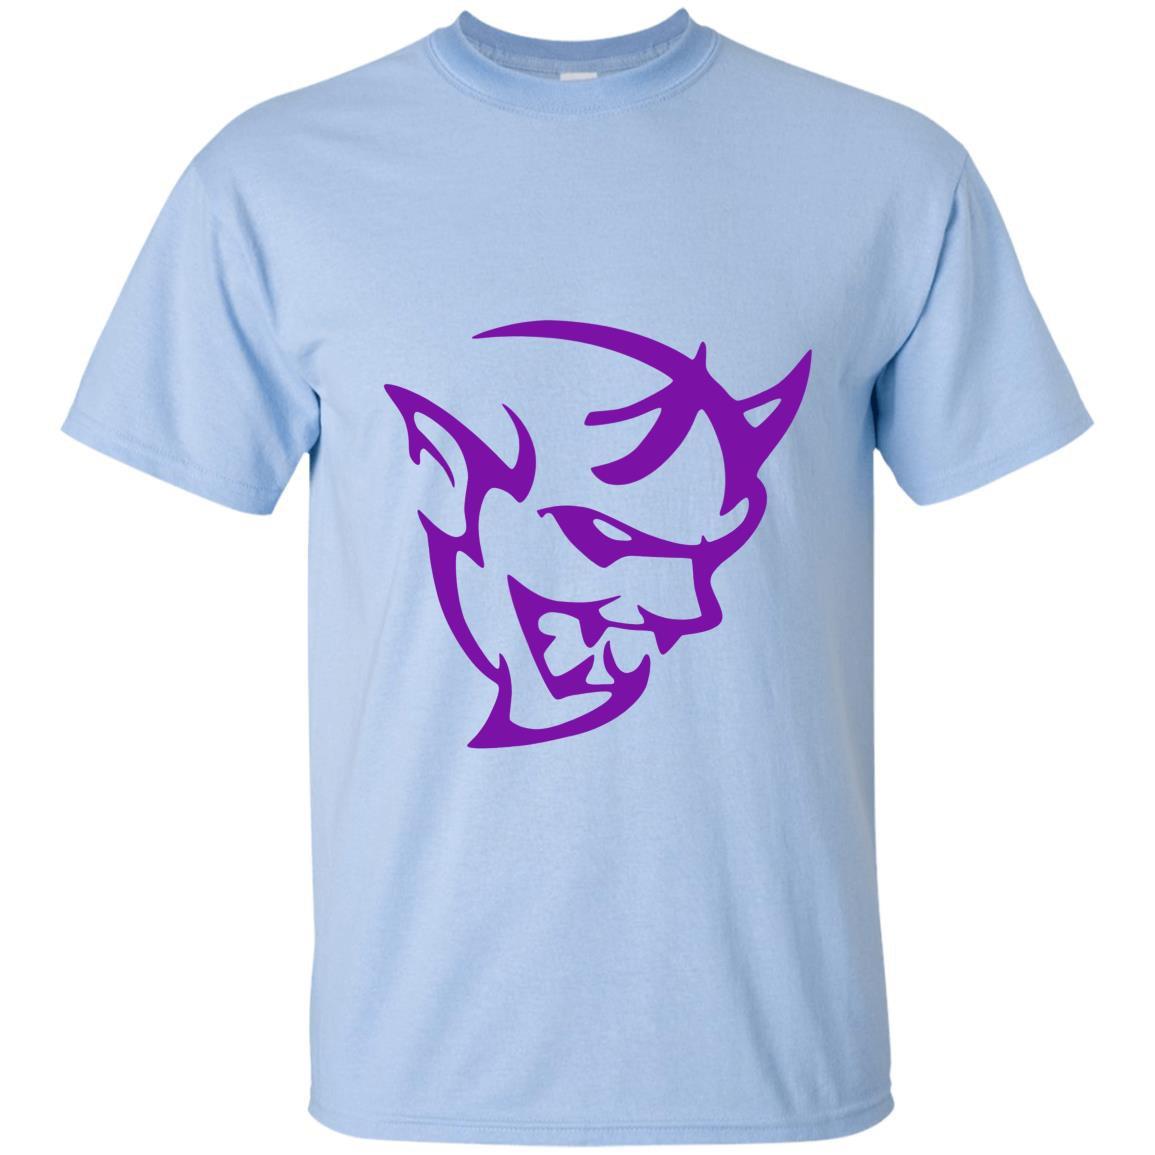 Srt demon dodge plum crazy T-shirt